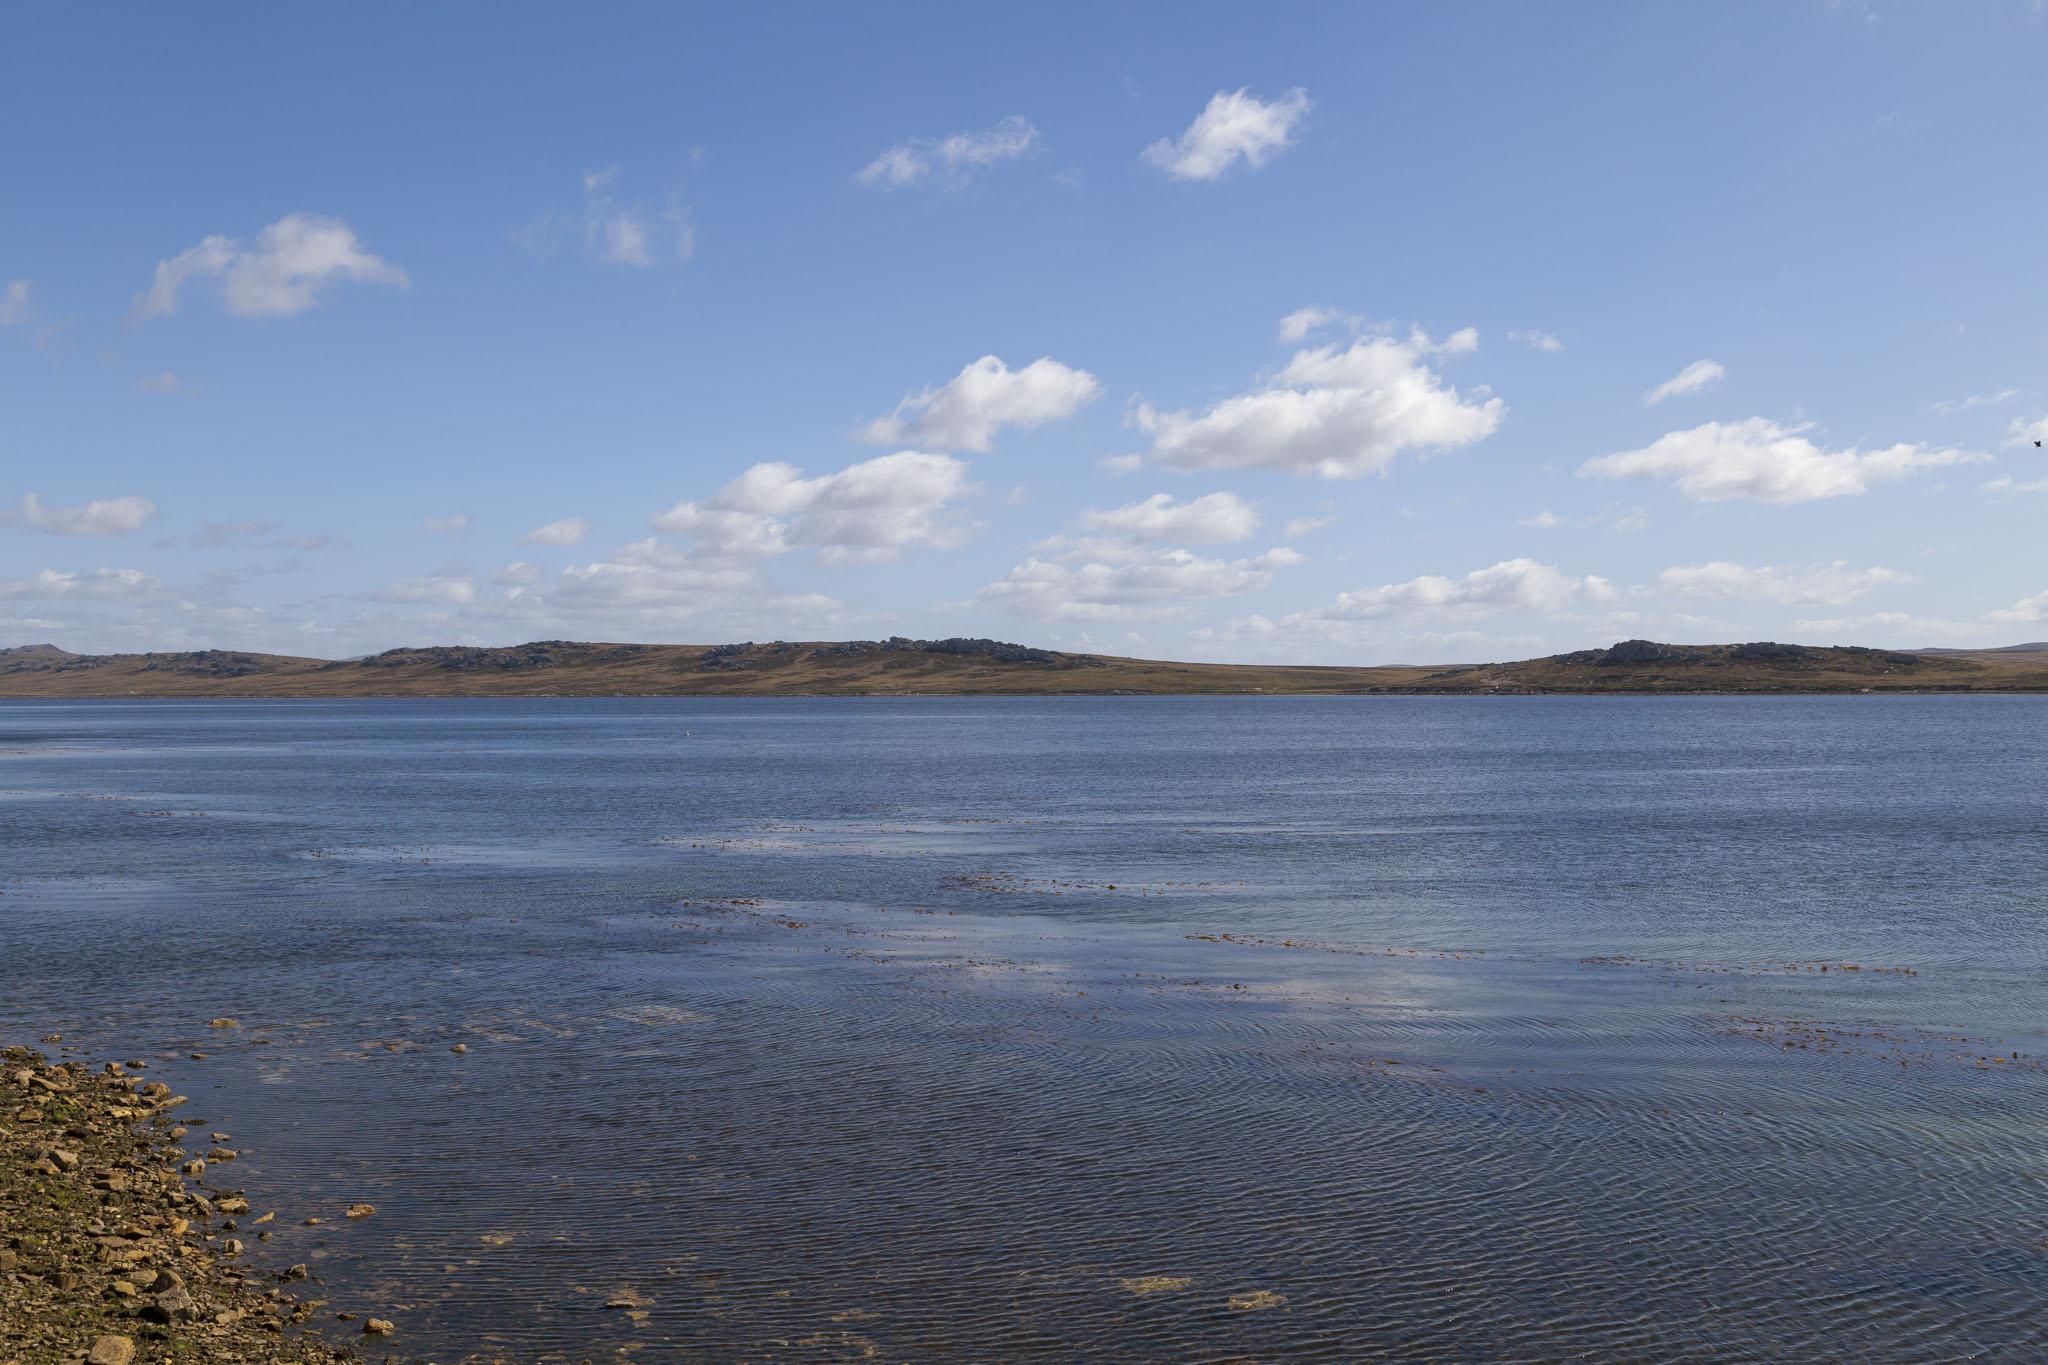 Stanley Harbour, Falkland Islands